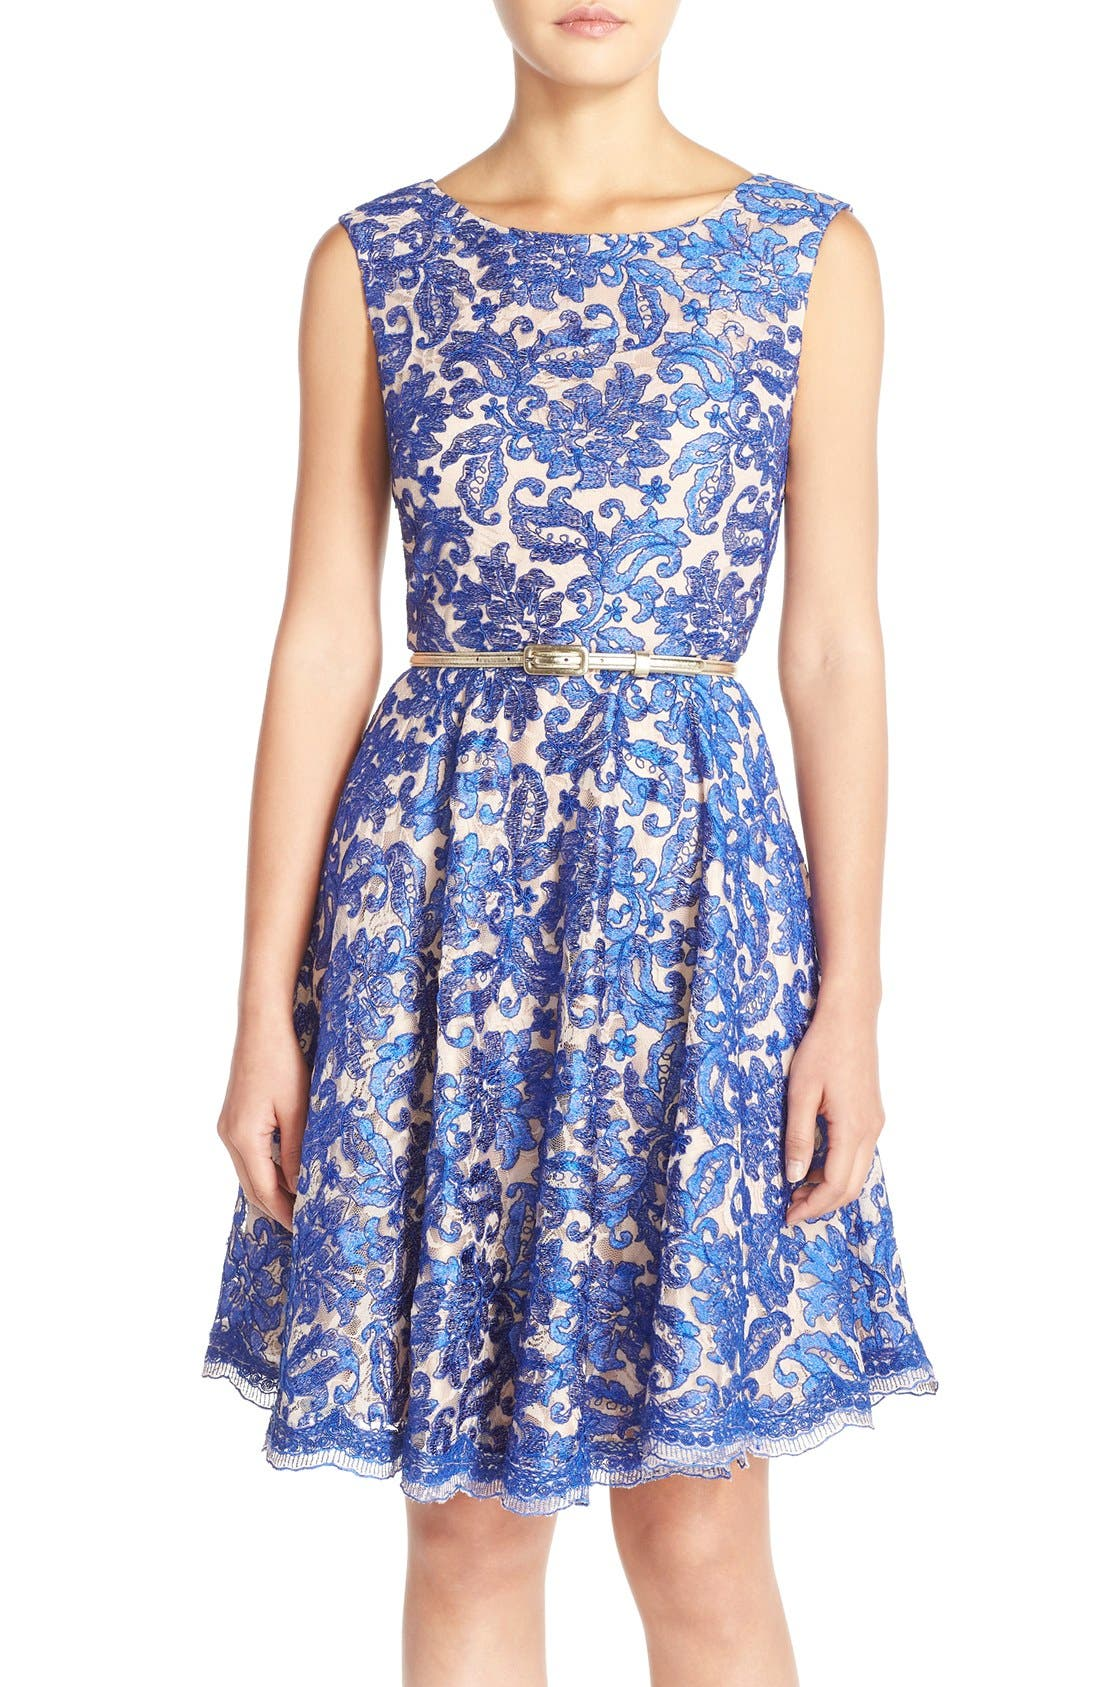 Main Image - Eliza J Embroidered Lace Fit & Flare Dress (Regular & Petite)